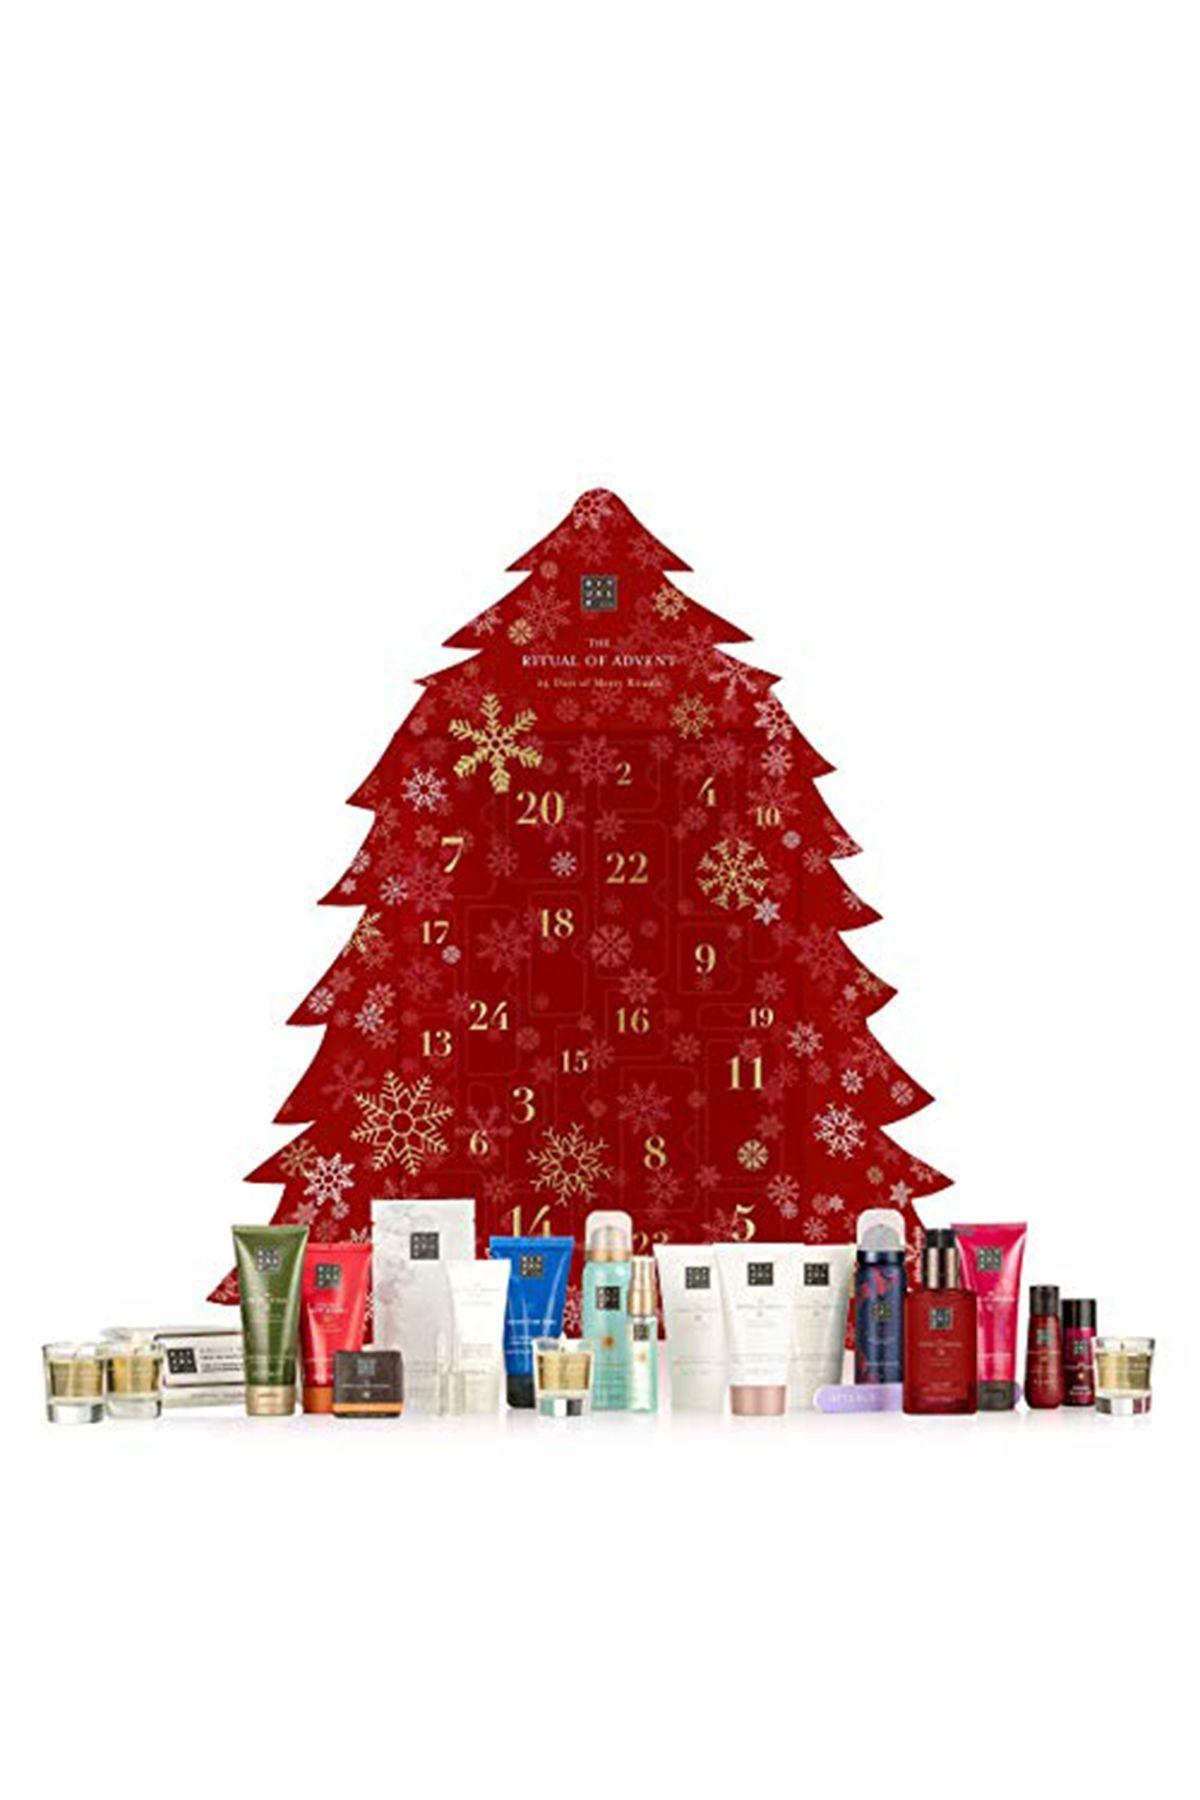 Christmas Beauty.The Ritual Of Advent Calendar Gift Set